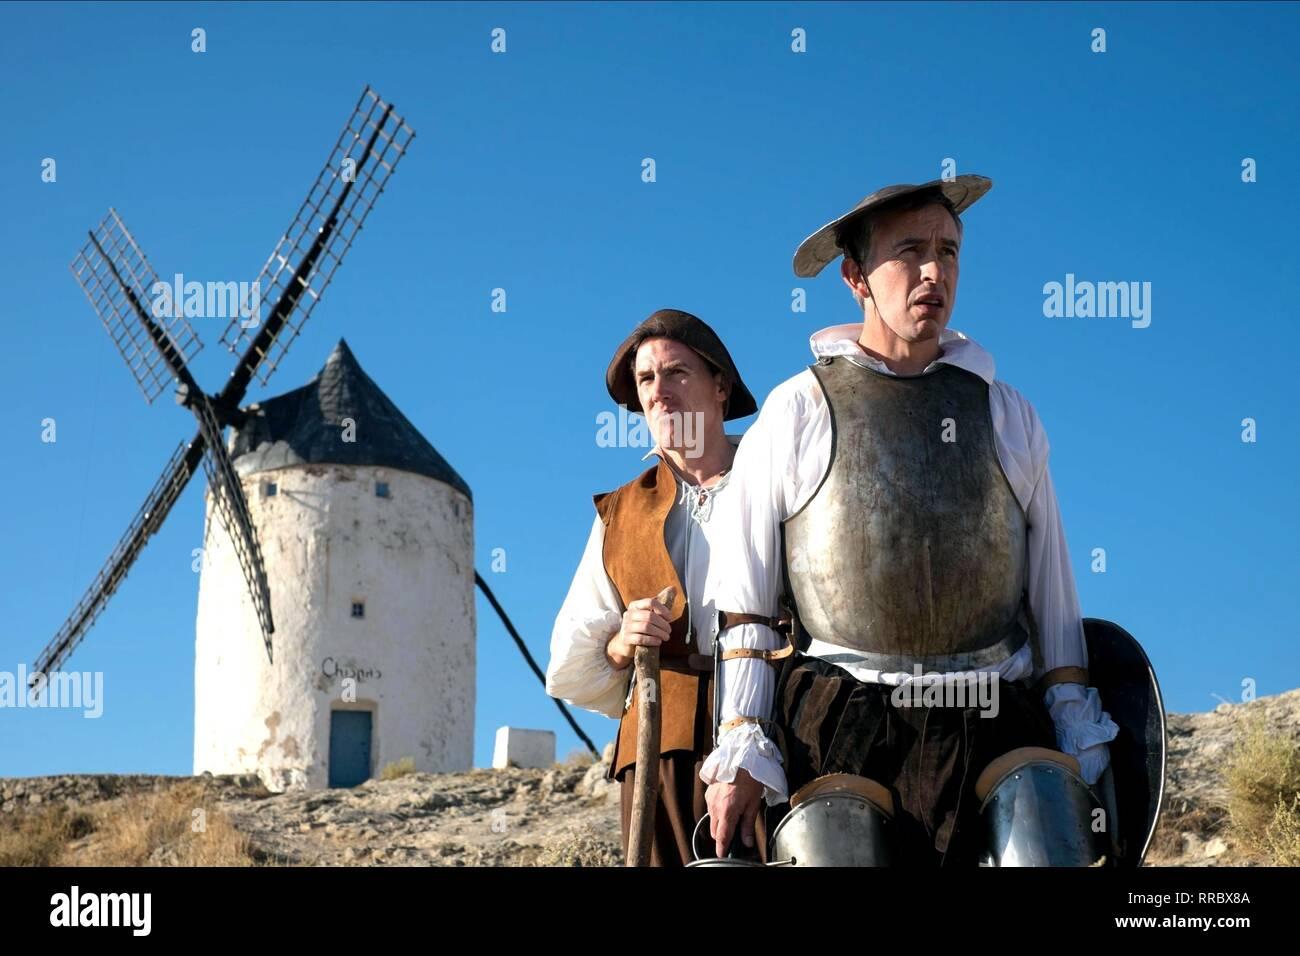 El viaje a España, Rob Brydon , Steve Coogan, 2017 Imagen De Stock